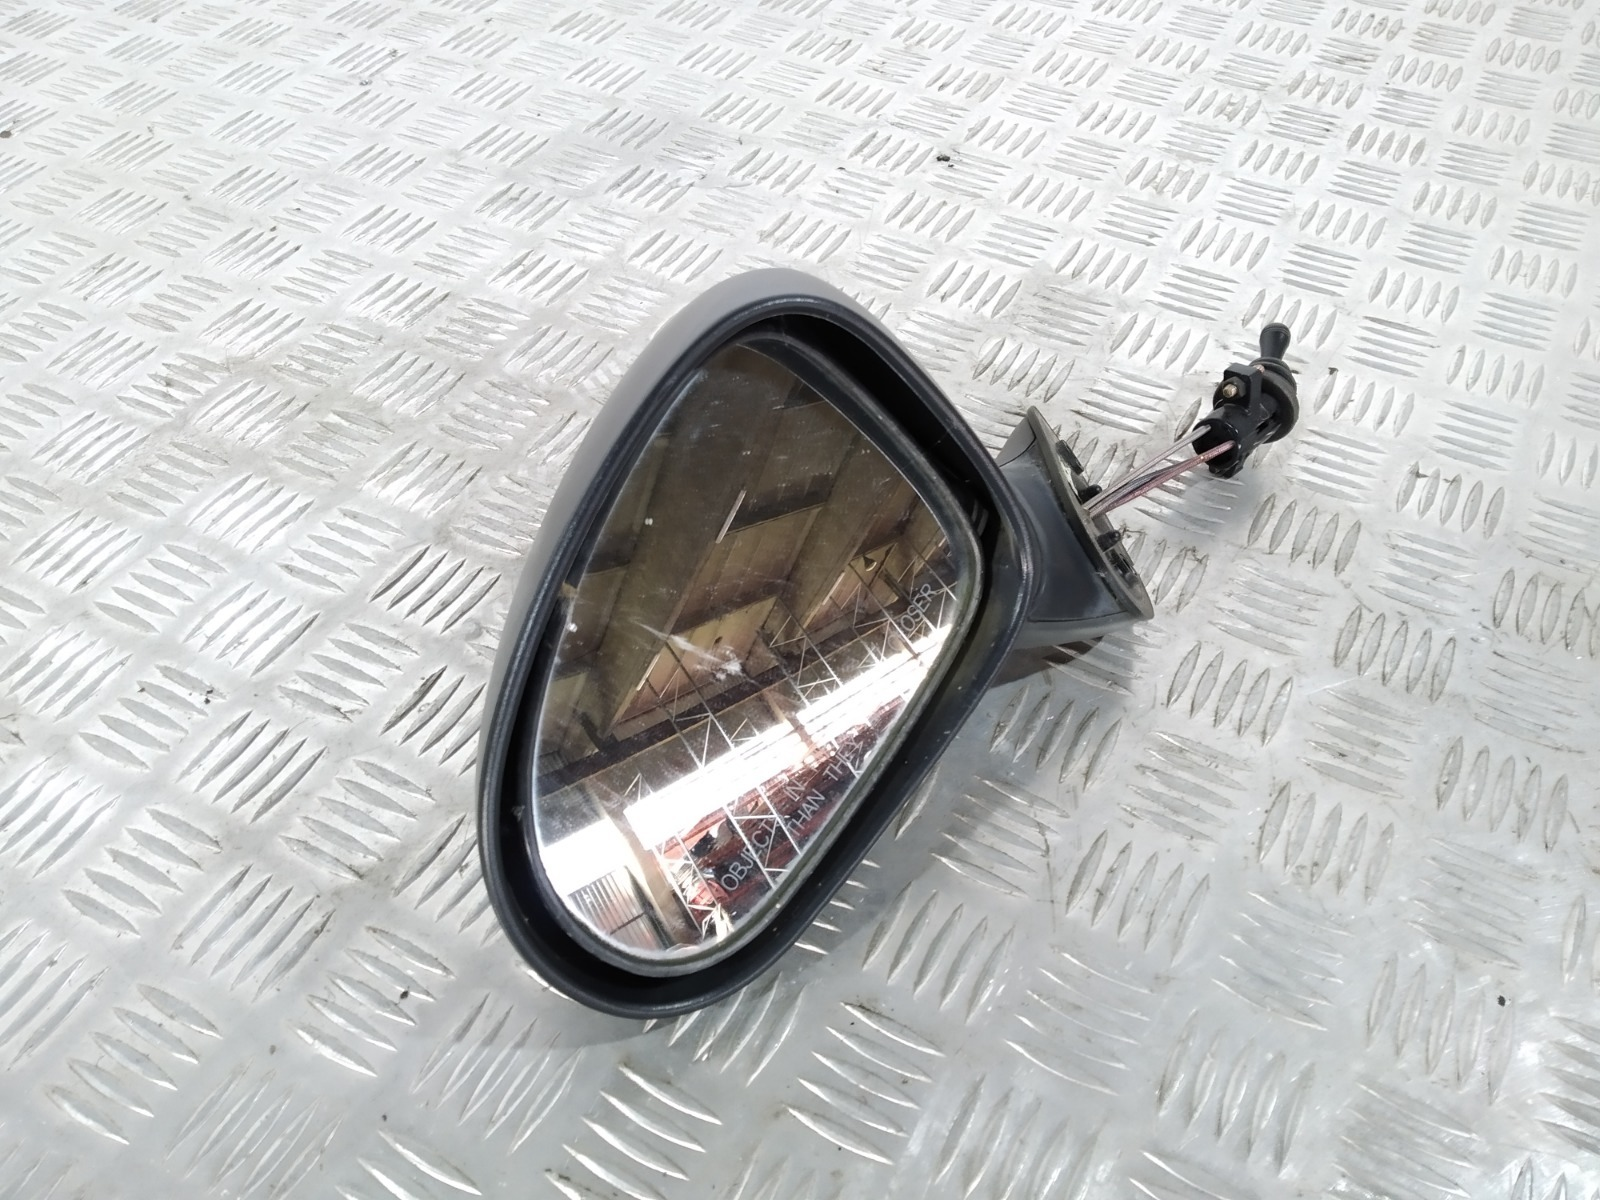 Зеркало наружное левое Chevrolet Matiz 1.0 I 2006 (б/у)